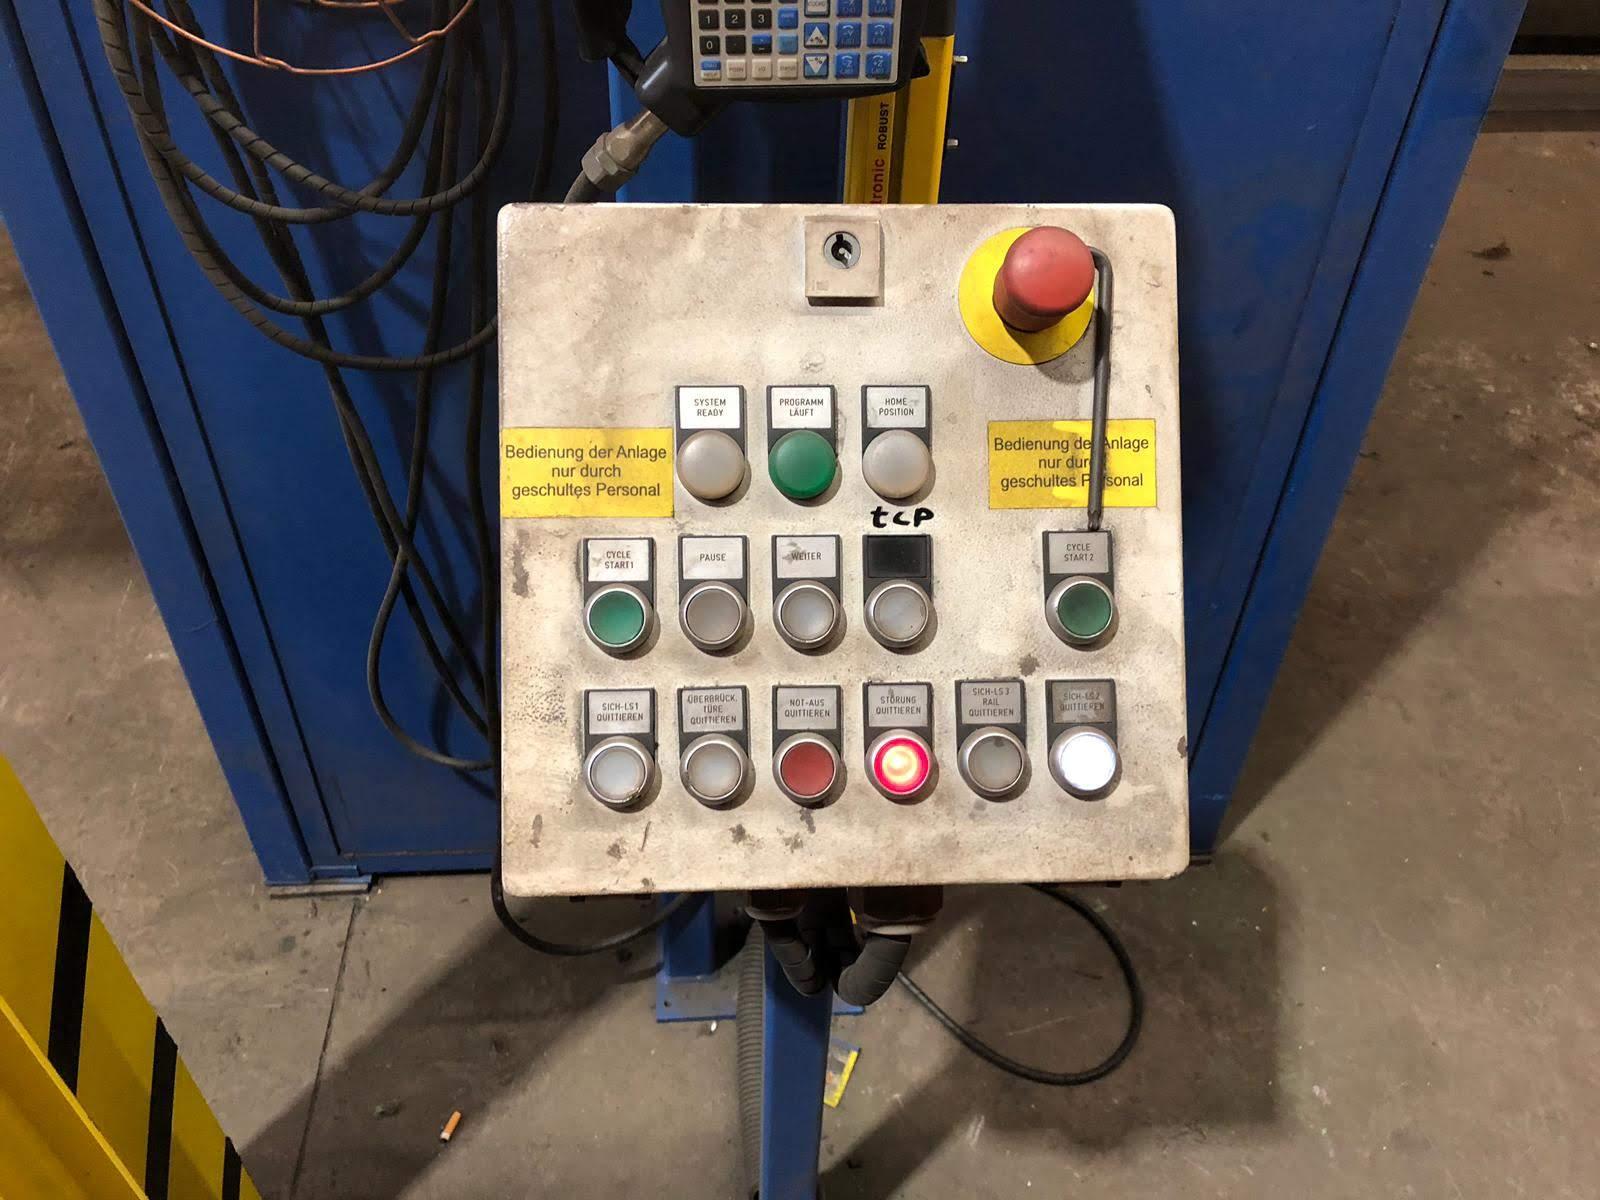 Fanuc RobWel ENKO 10 M - 450 A Welding machine - Exapro